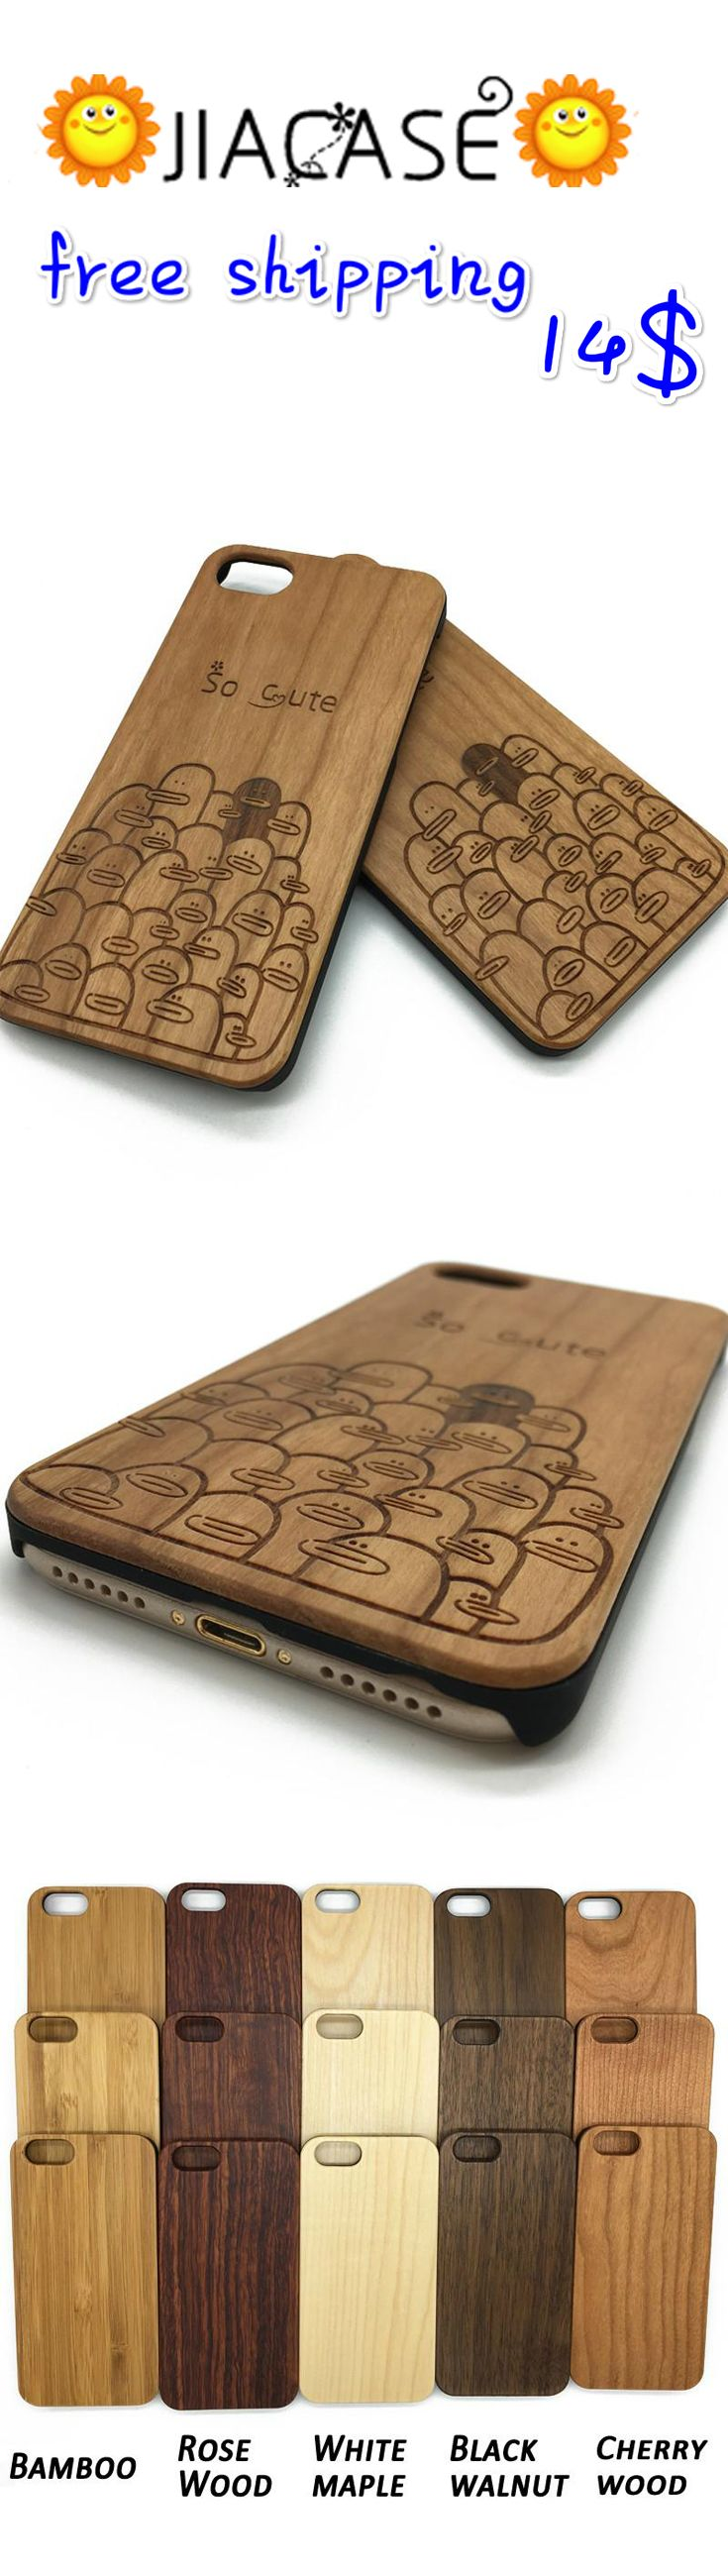 #Ducks Duck Illustration Pattern #IPhone #Samsung Galaxy S 7 #Wooden #Case